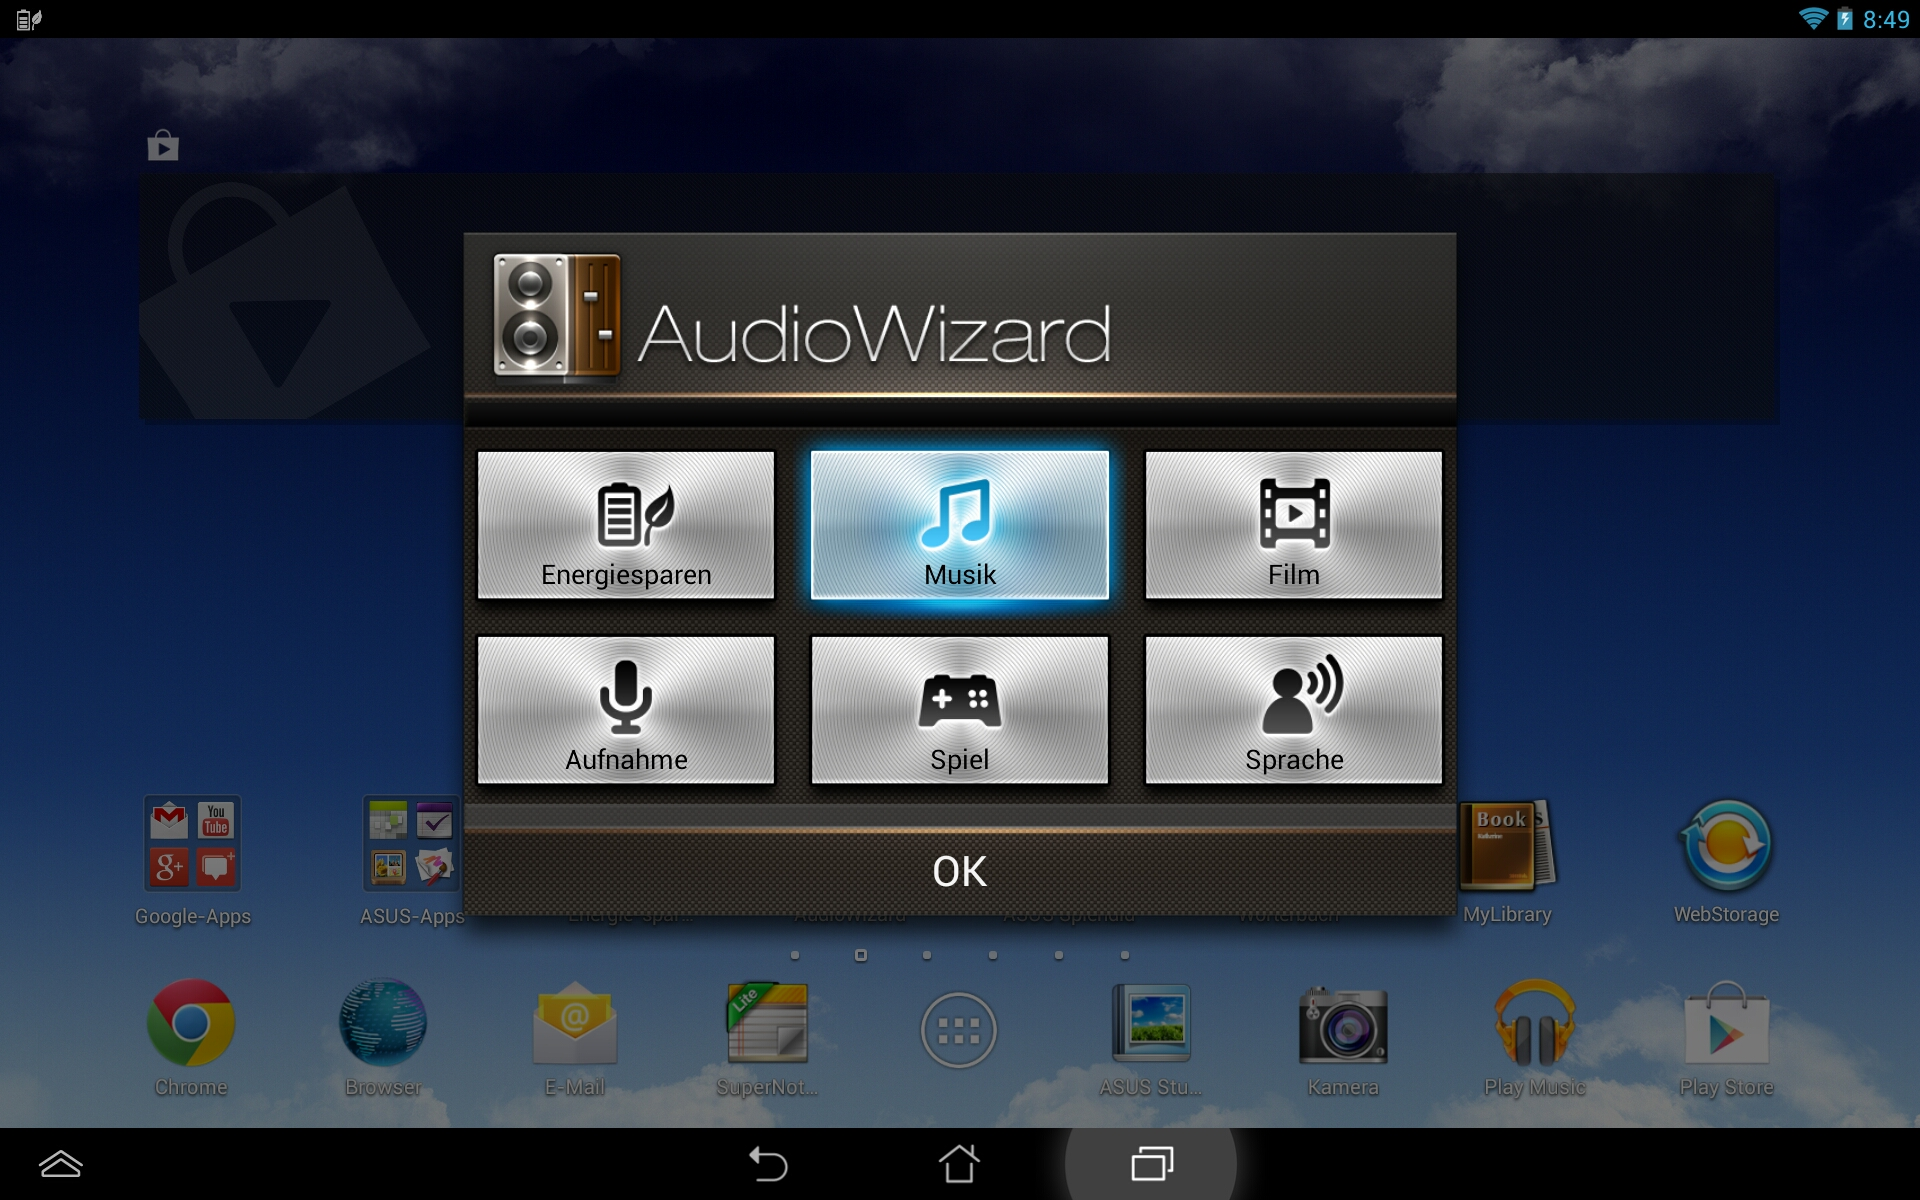 audiowizard asus driver download